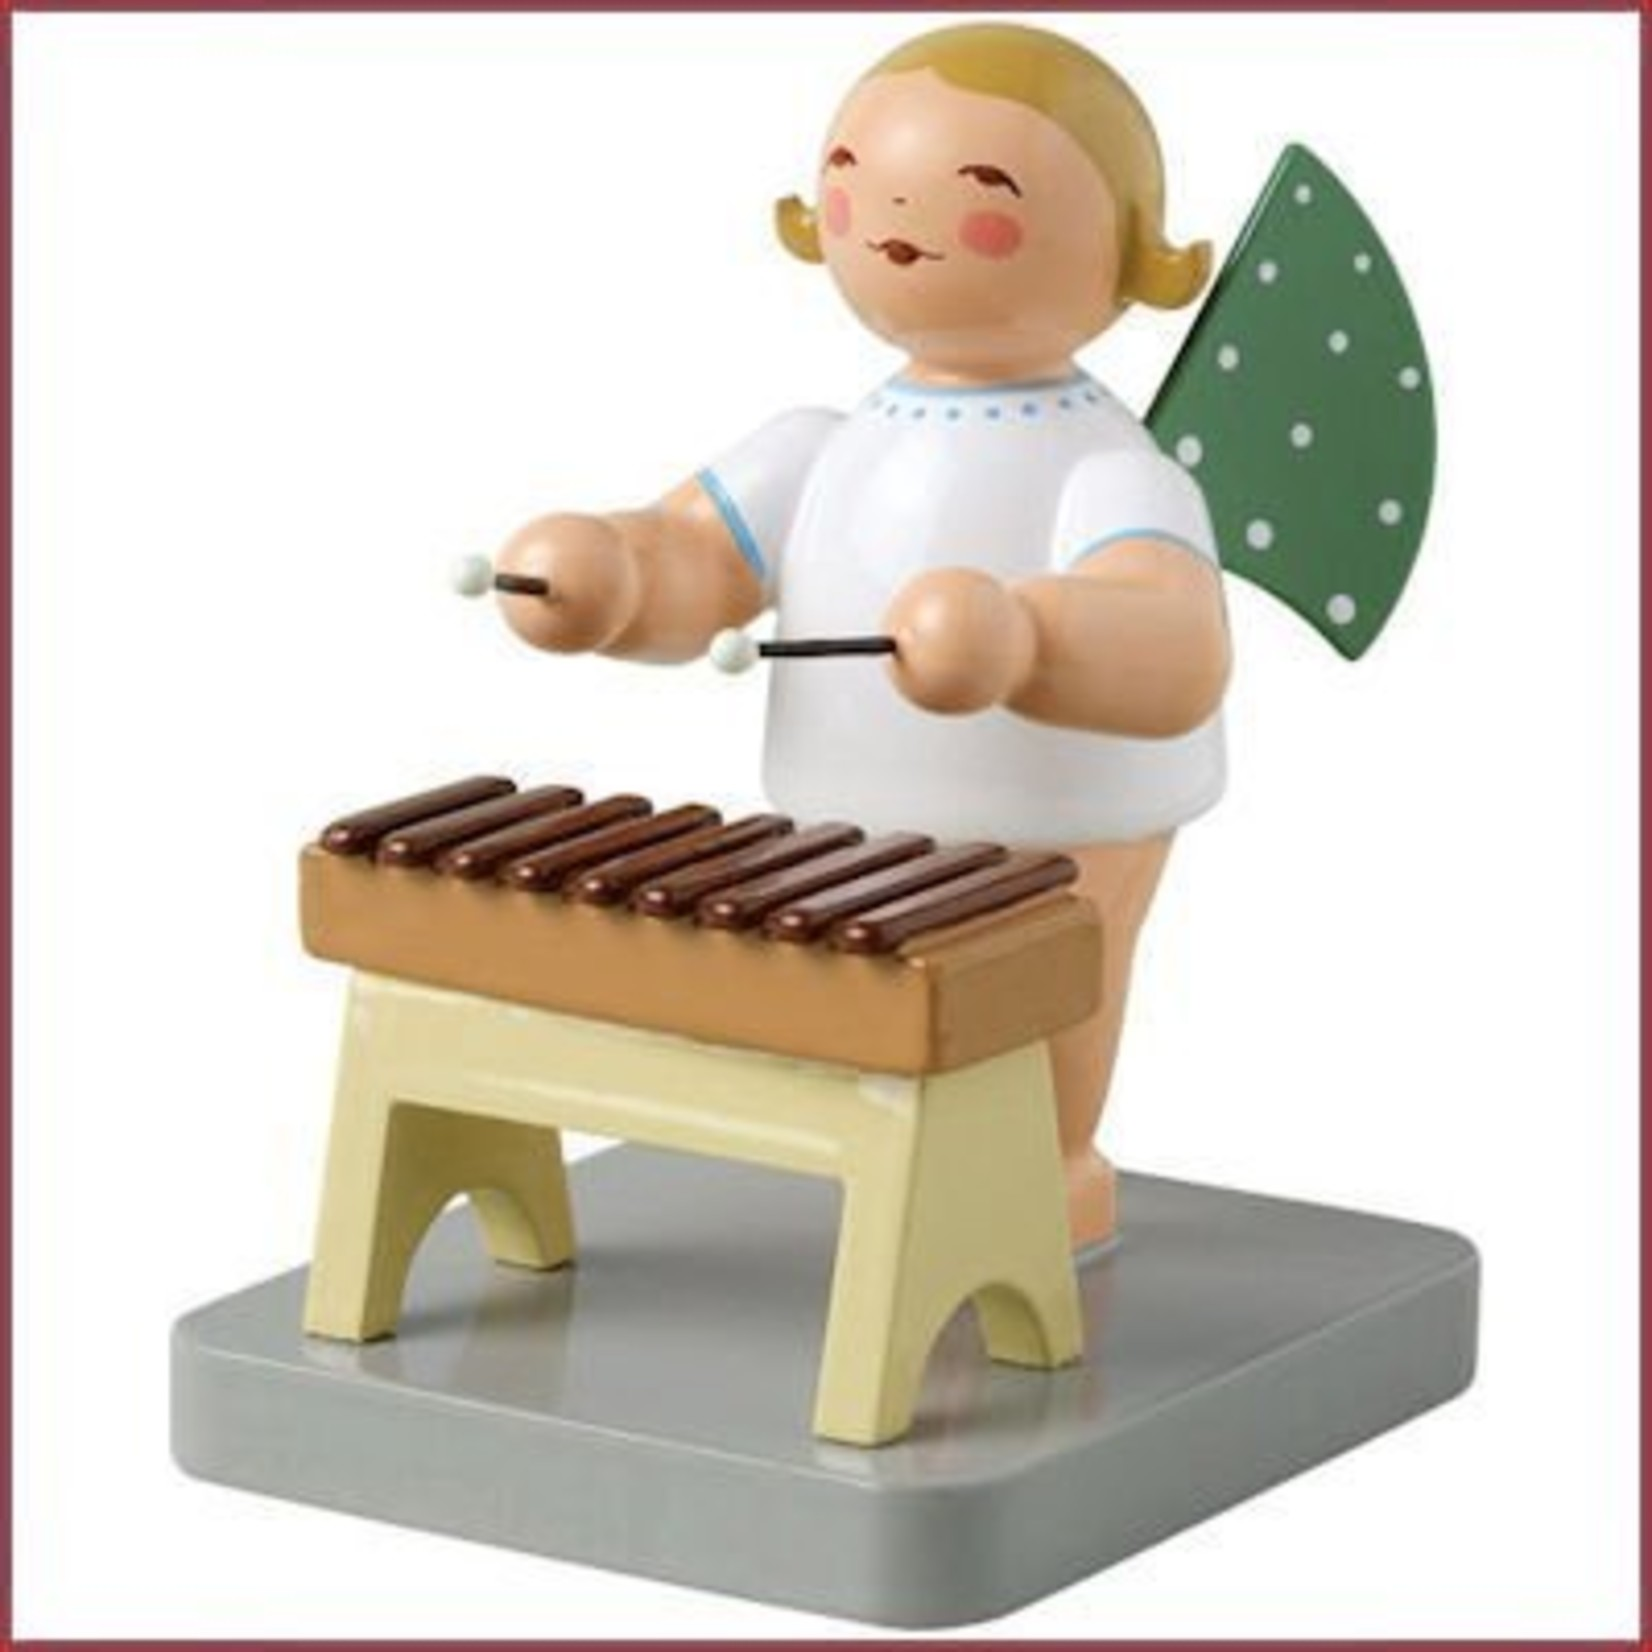 Wendt & Kühn Grunhainichense Engel met xylofoon